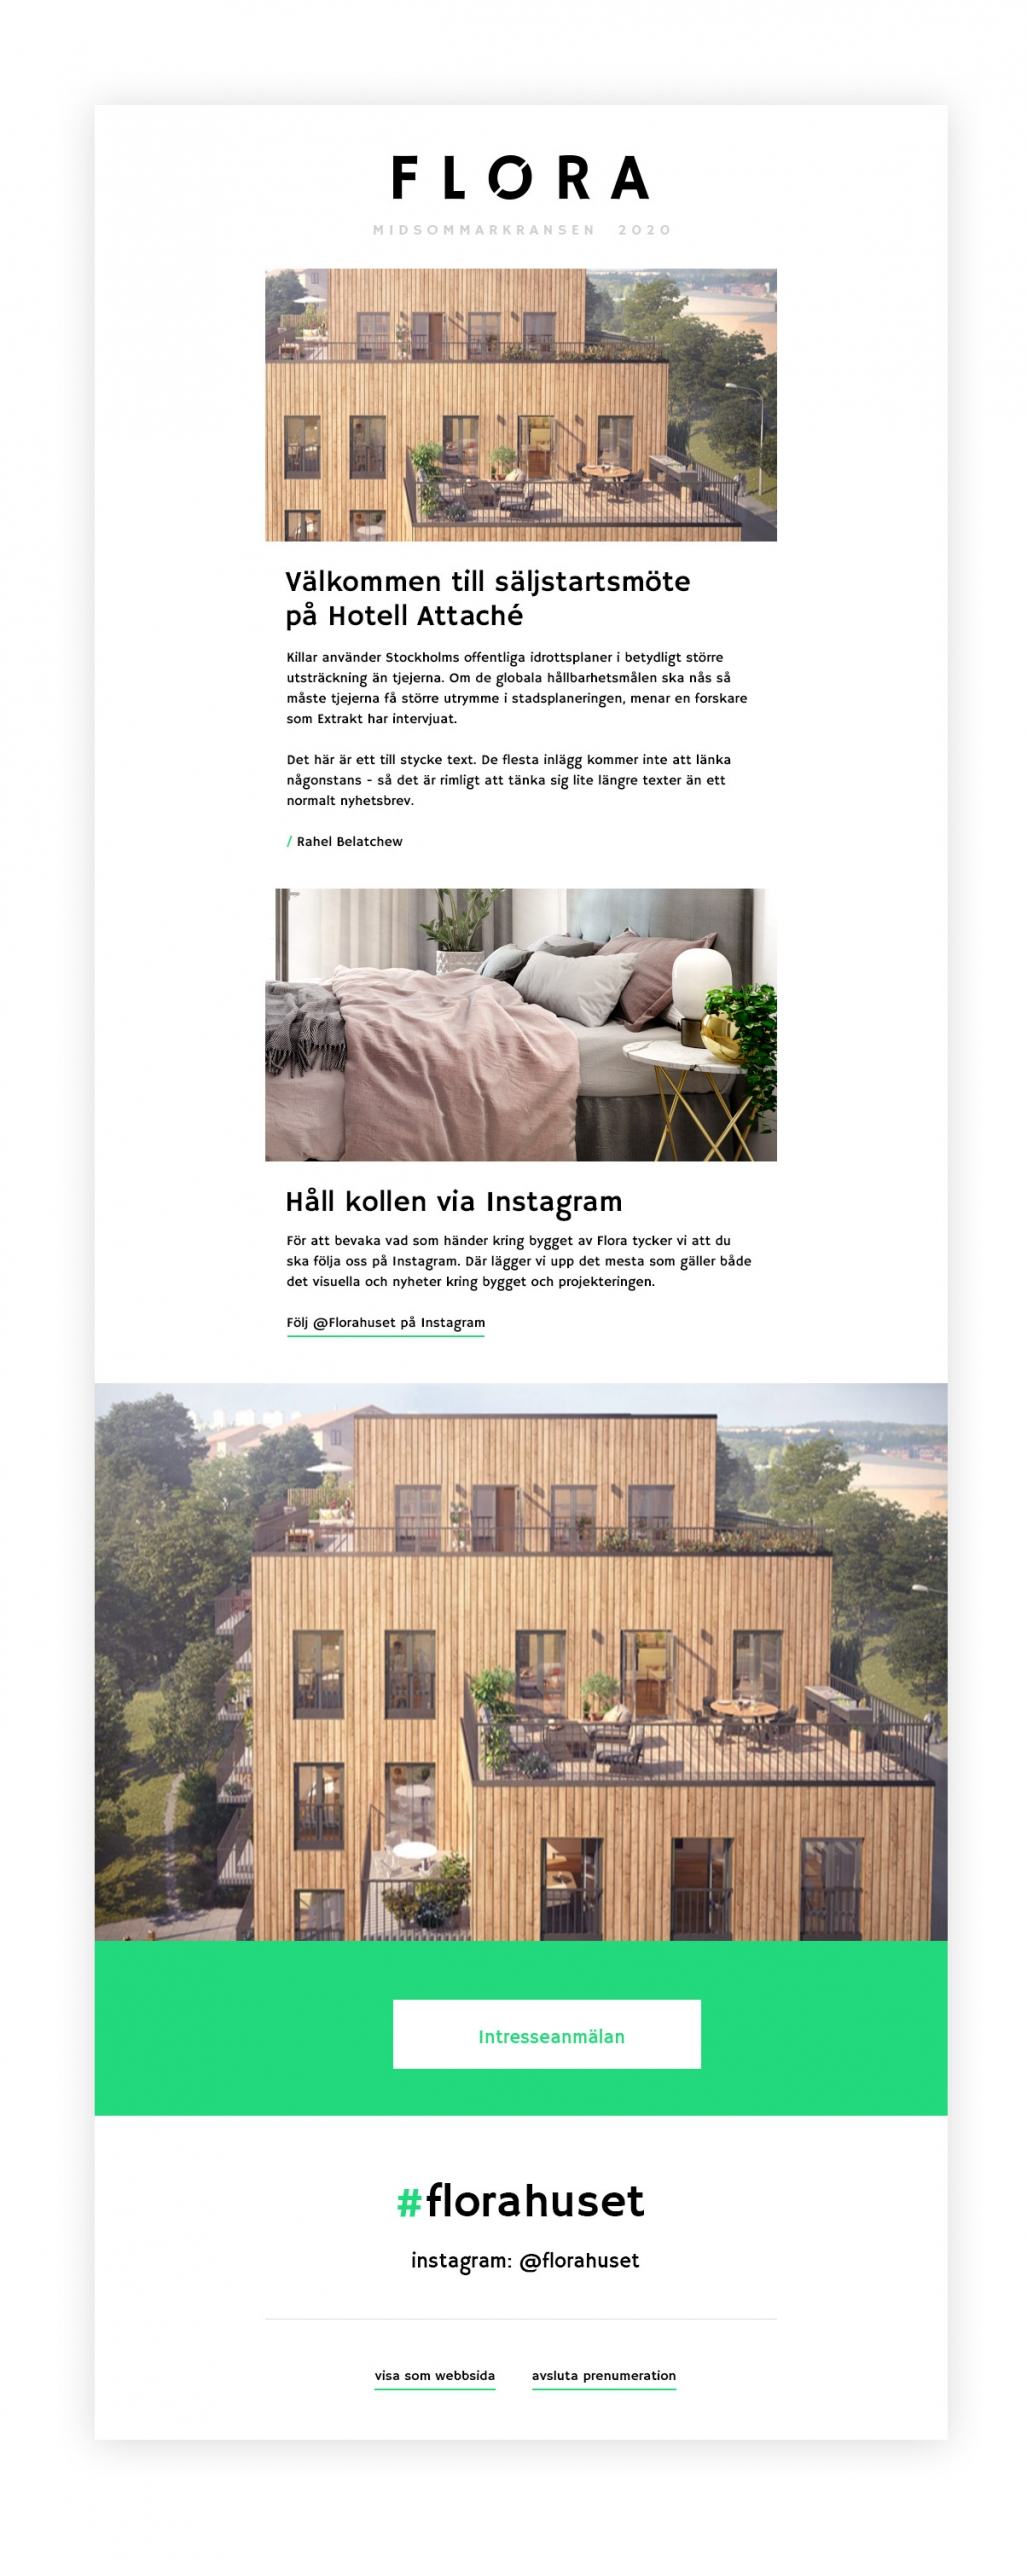 Flora bostadsprojekt Wonderfour digitalbyrå